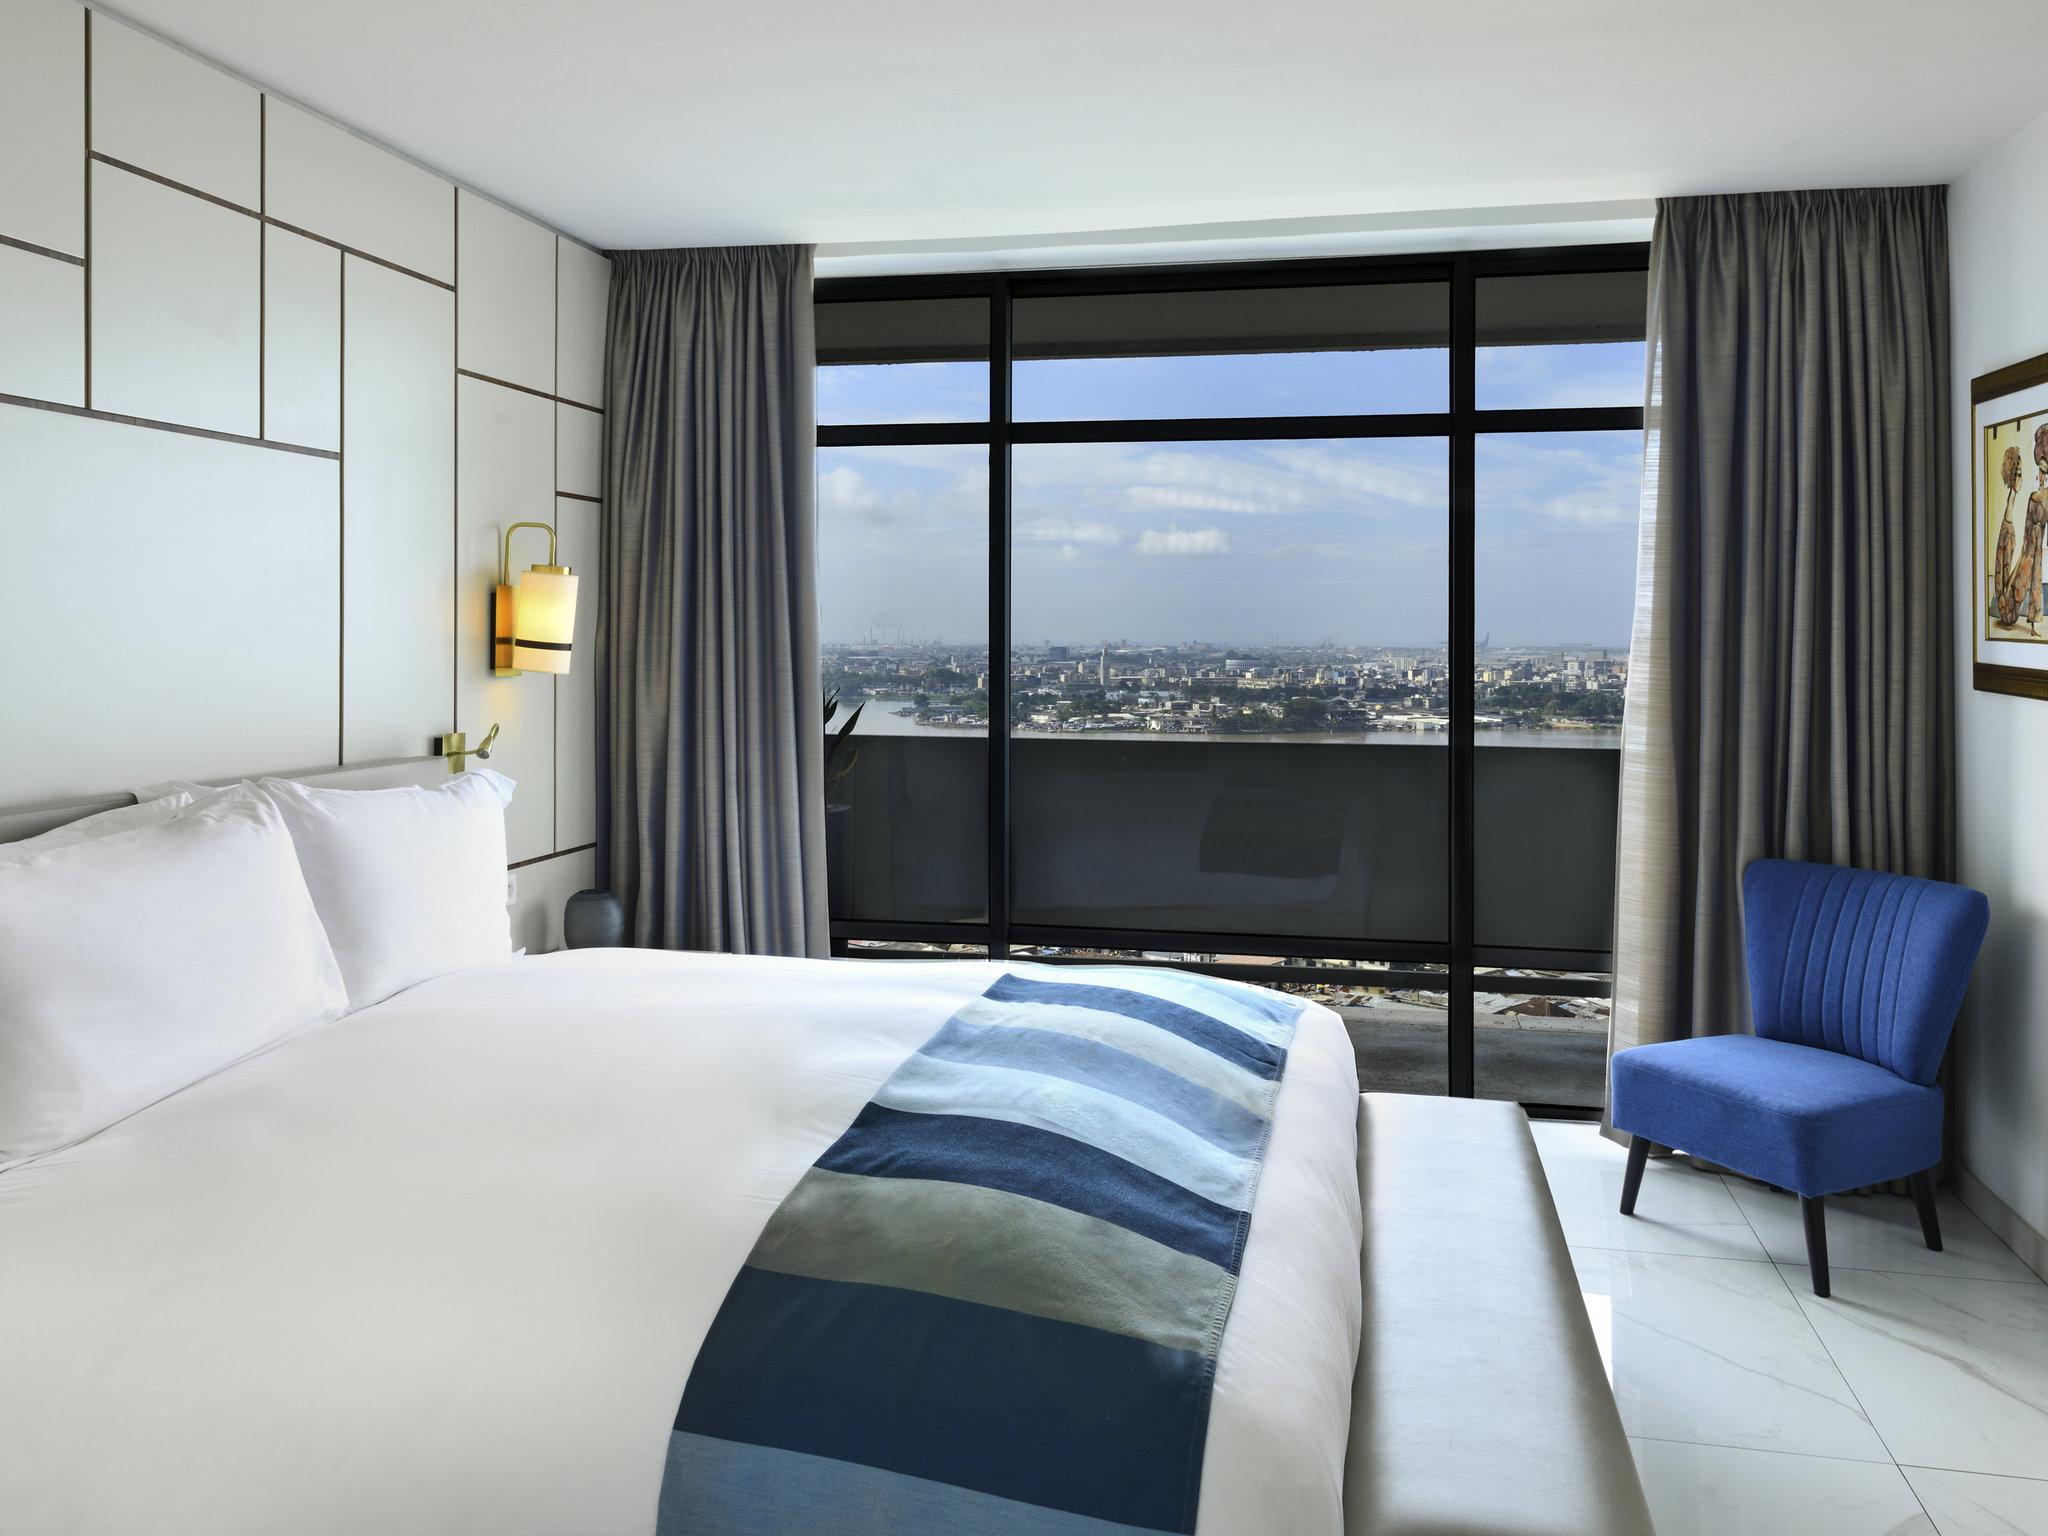 Hotel – Sofitel Abidjan Hotel Ivoire